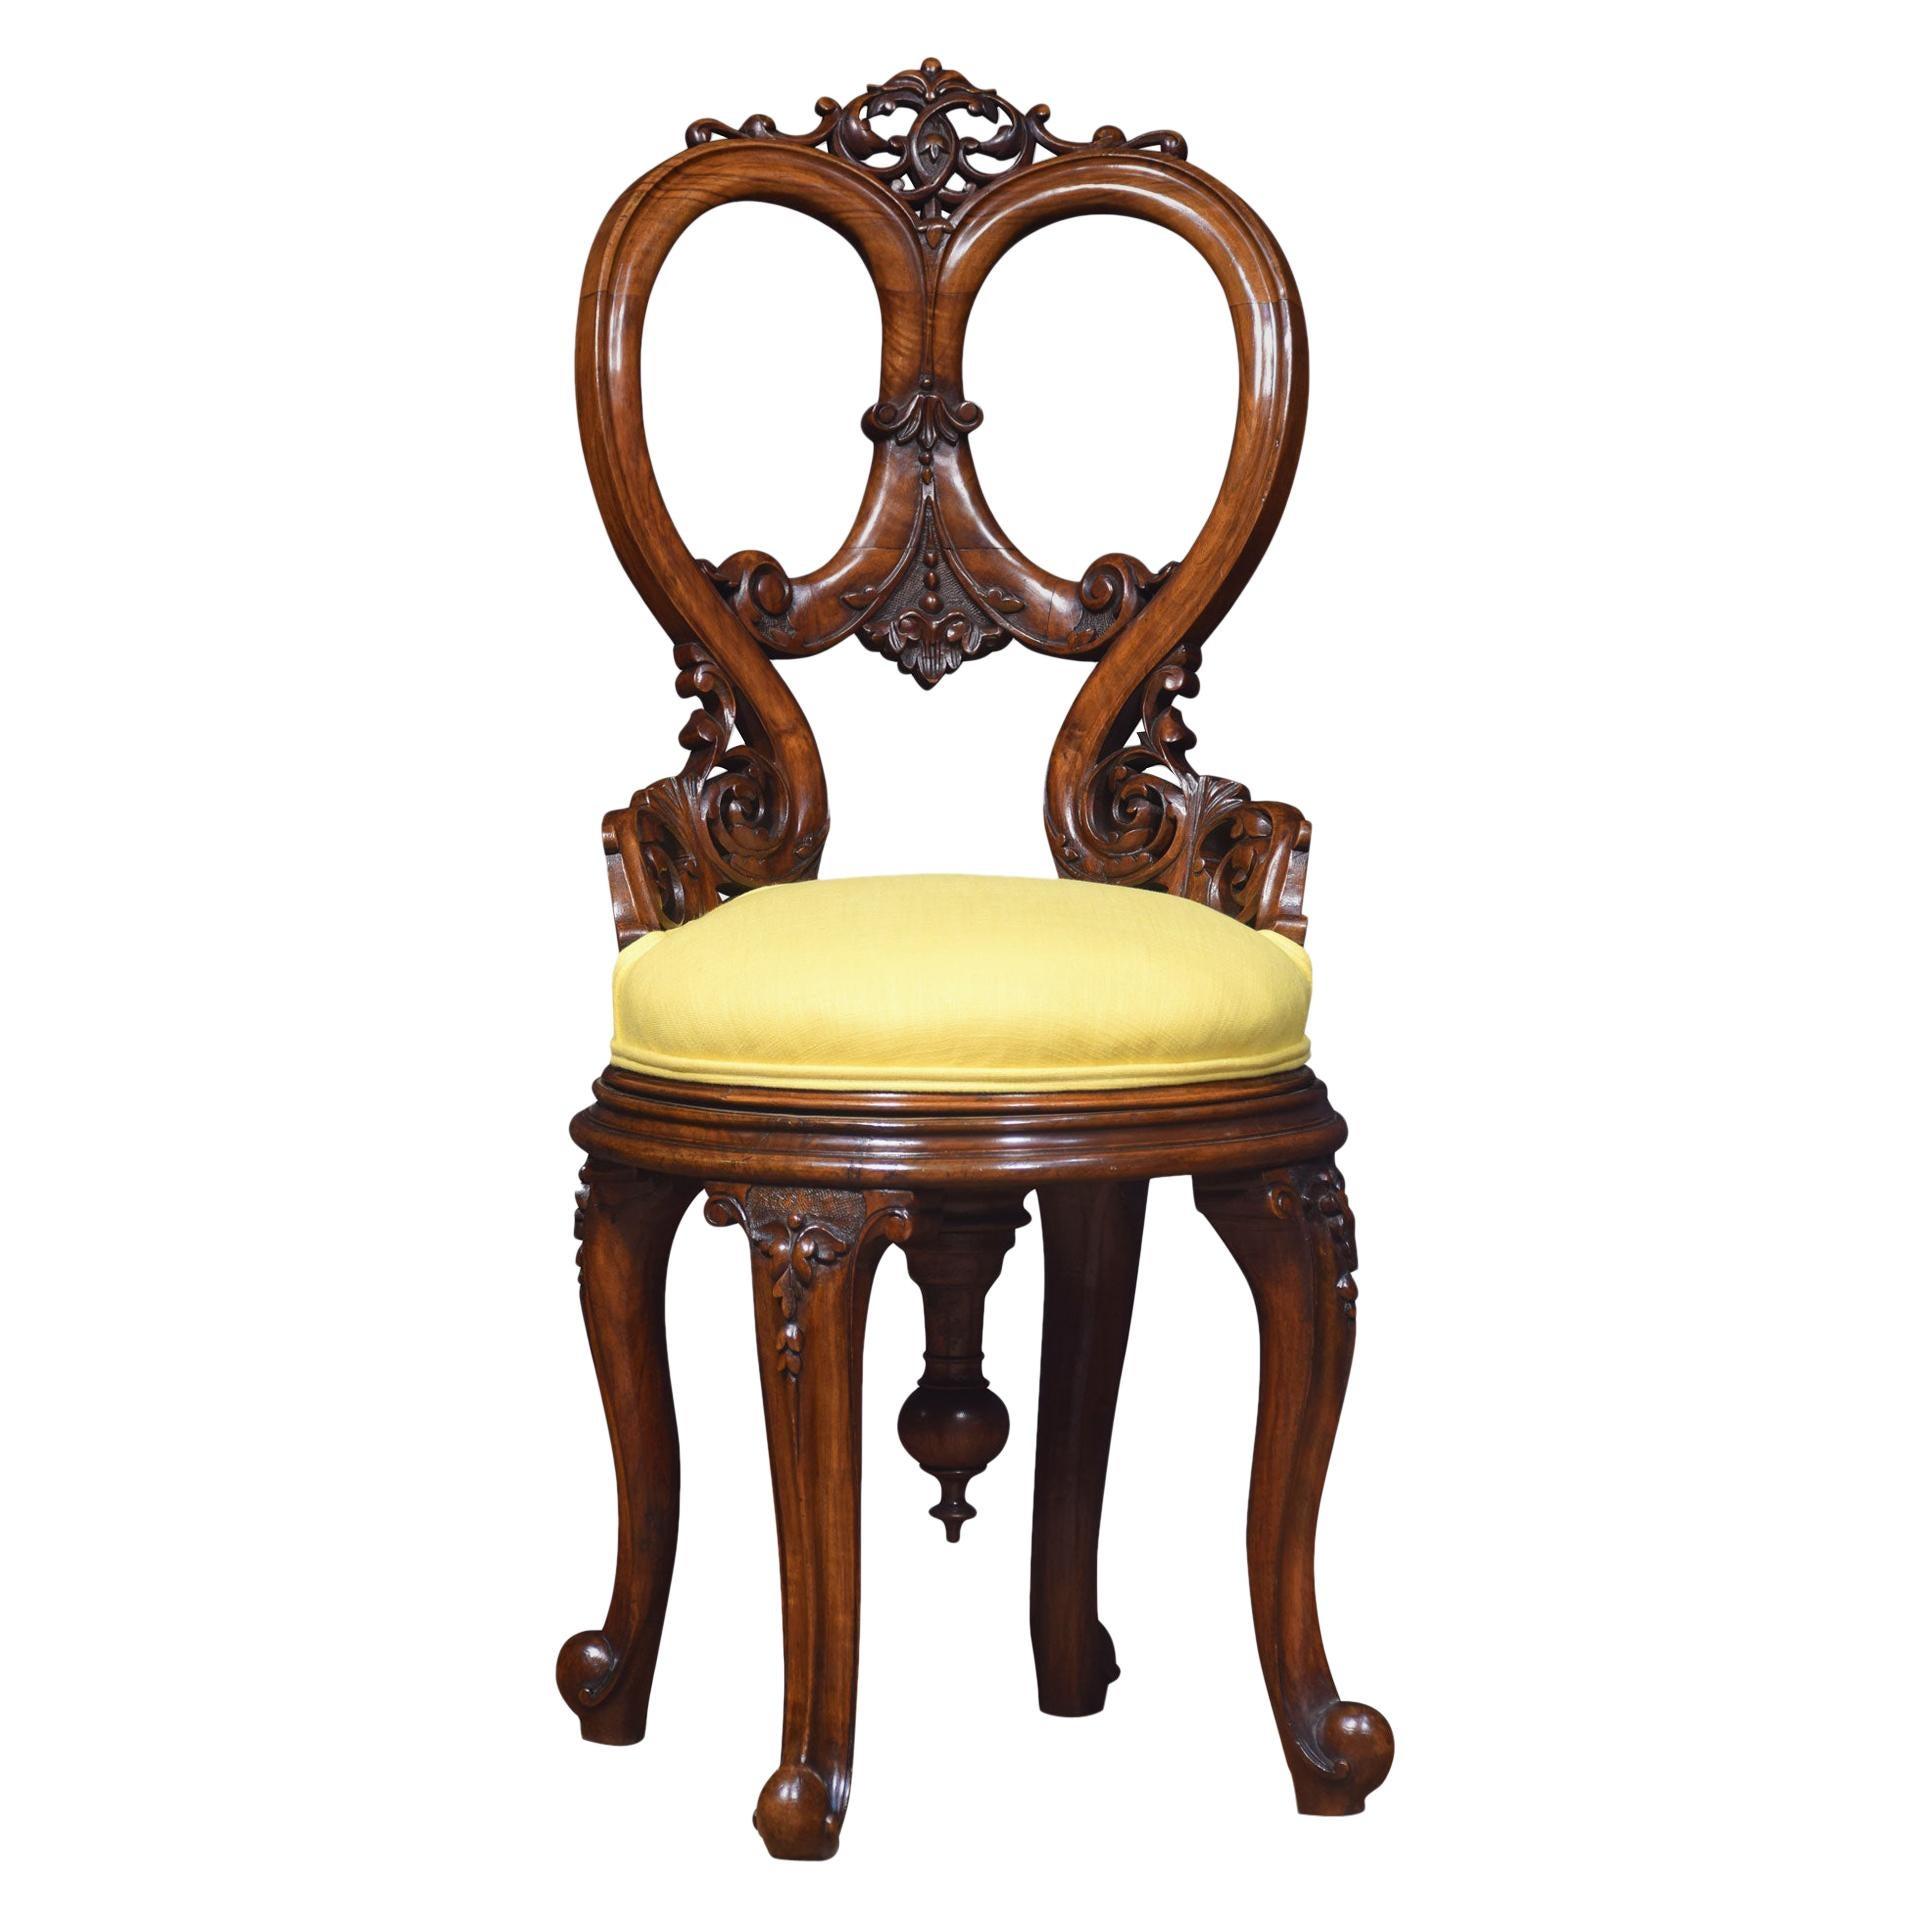 19th Century Revolving Walnut Dressing Chair